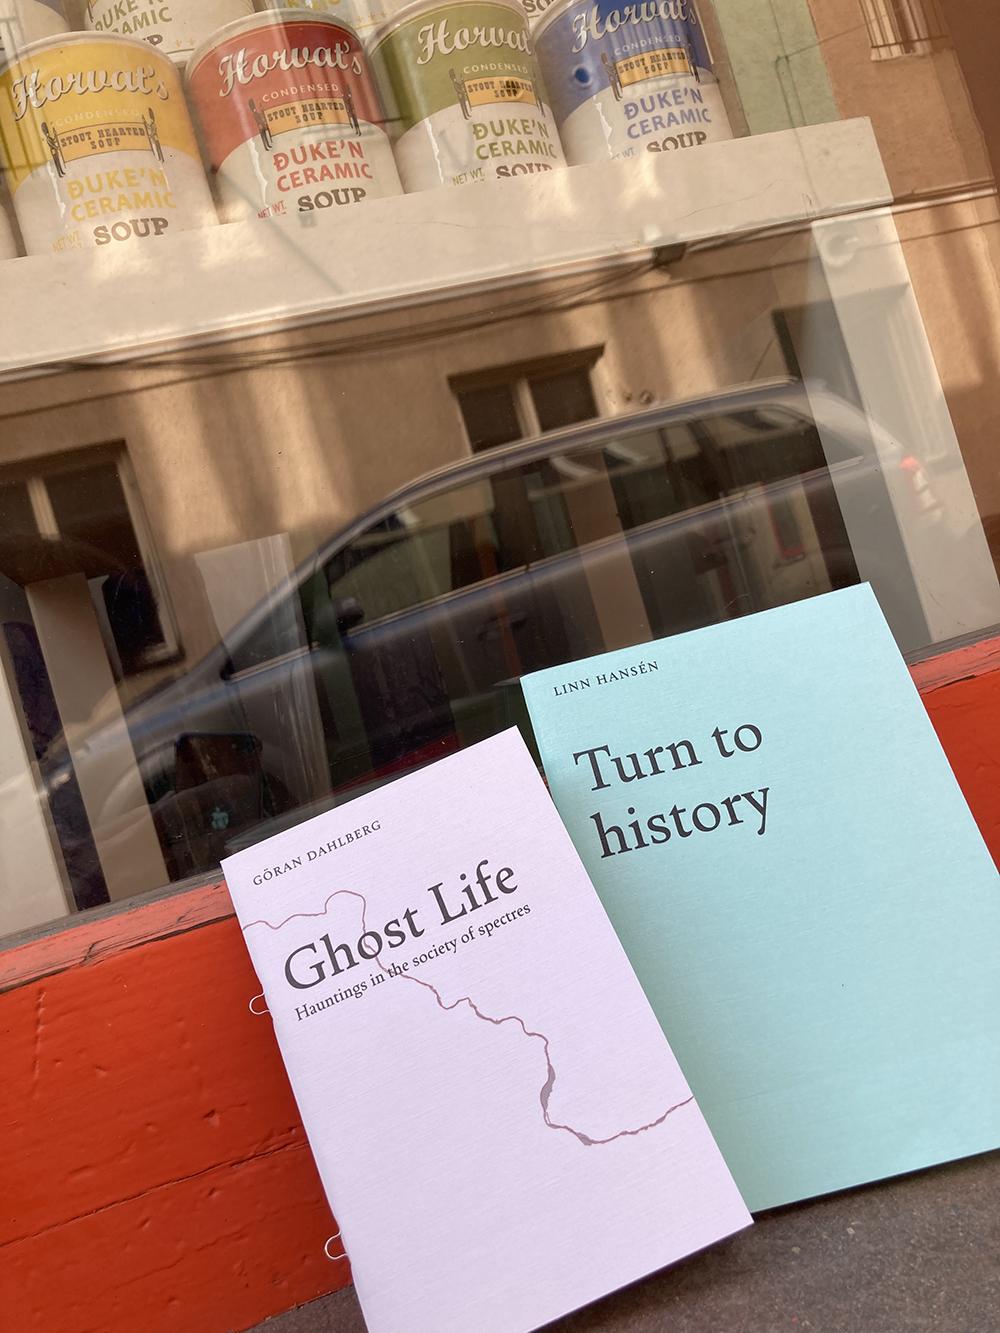 Linn Hansén • Turn to history ||  Göran Dahlberg • Ghost Life